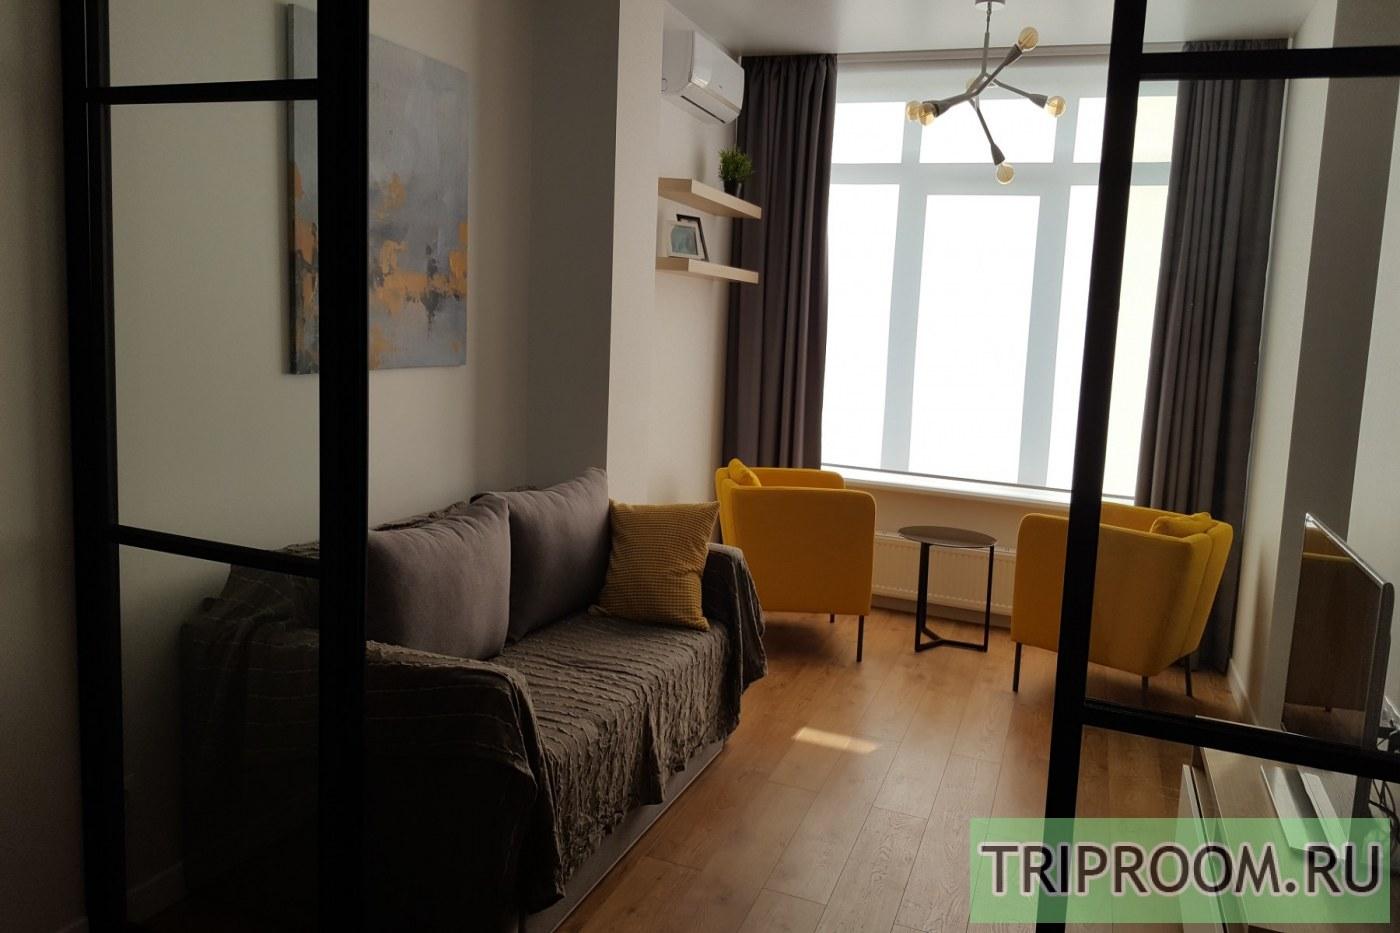 1-комнатная квартира посуточно (вариант № 37548), ул. Парковая улица, фото № 4